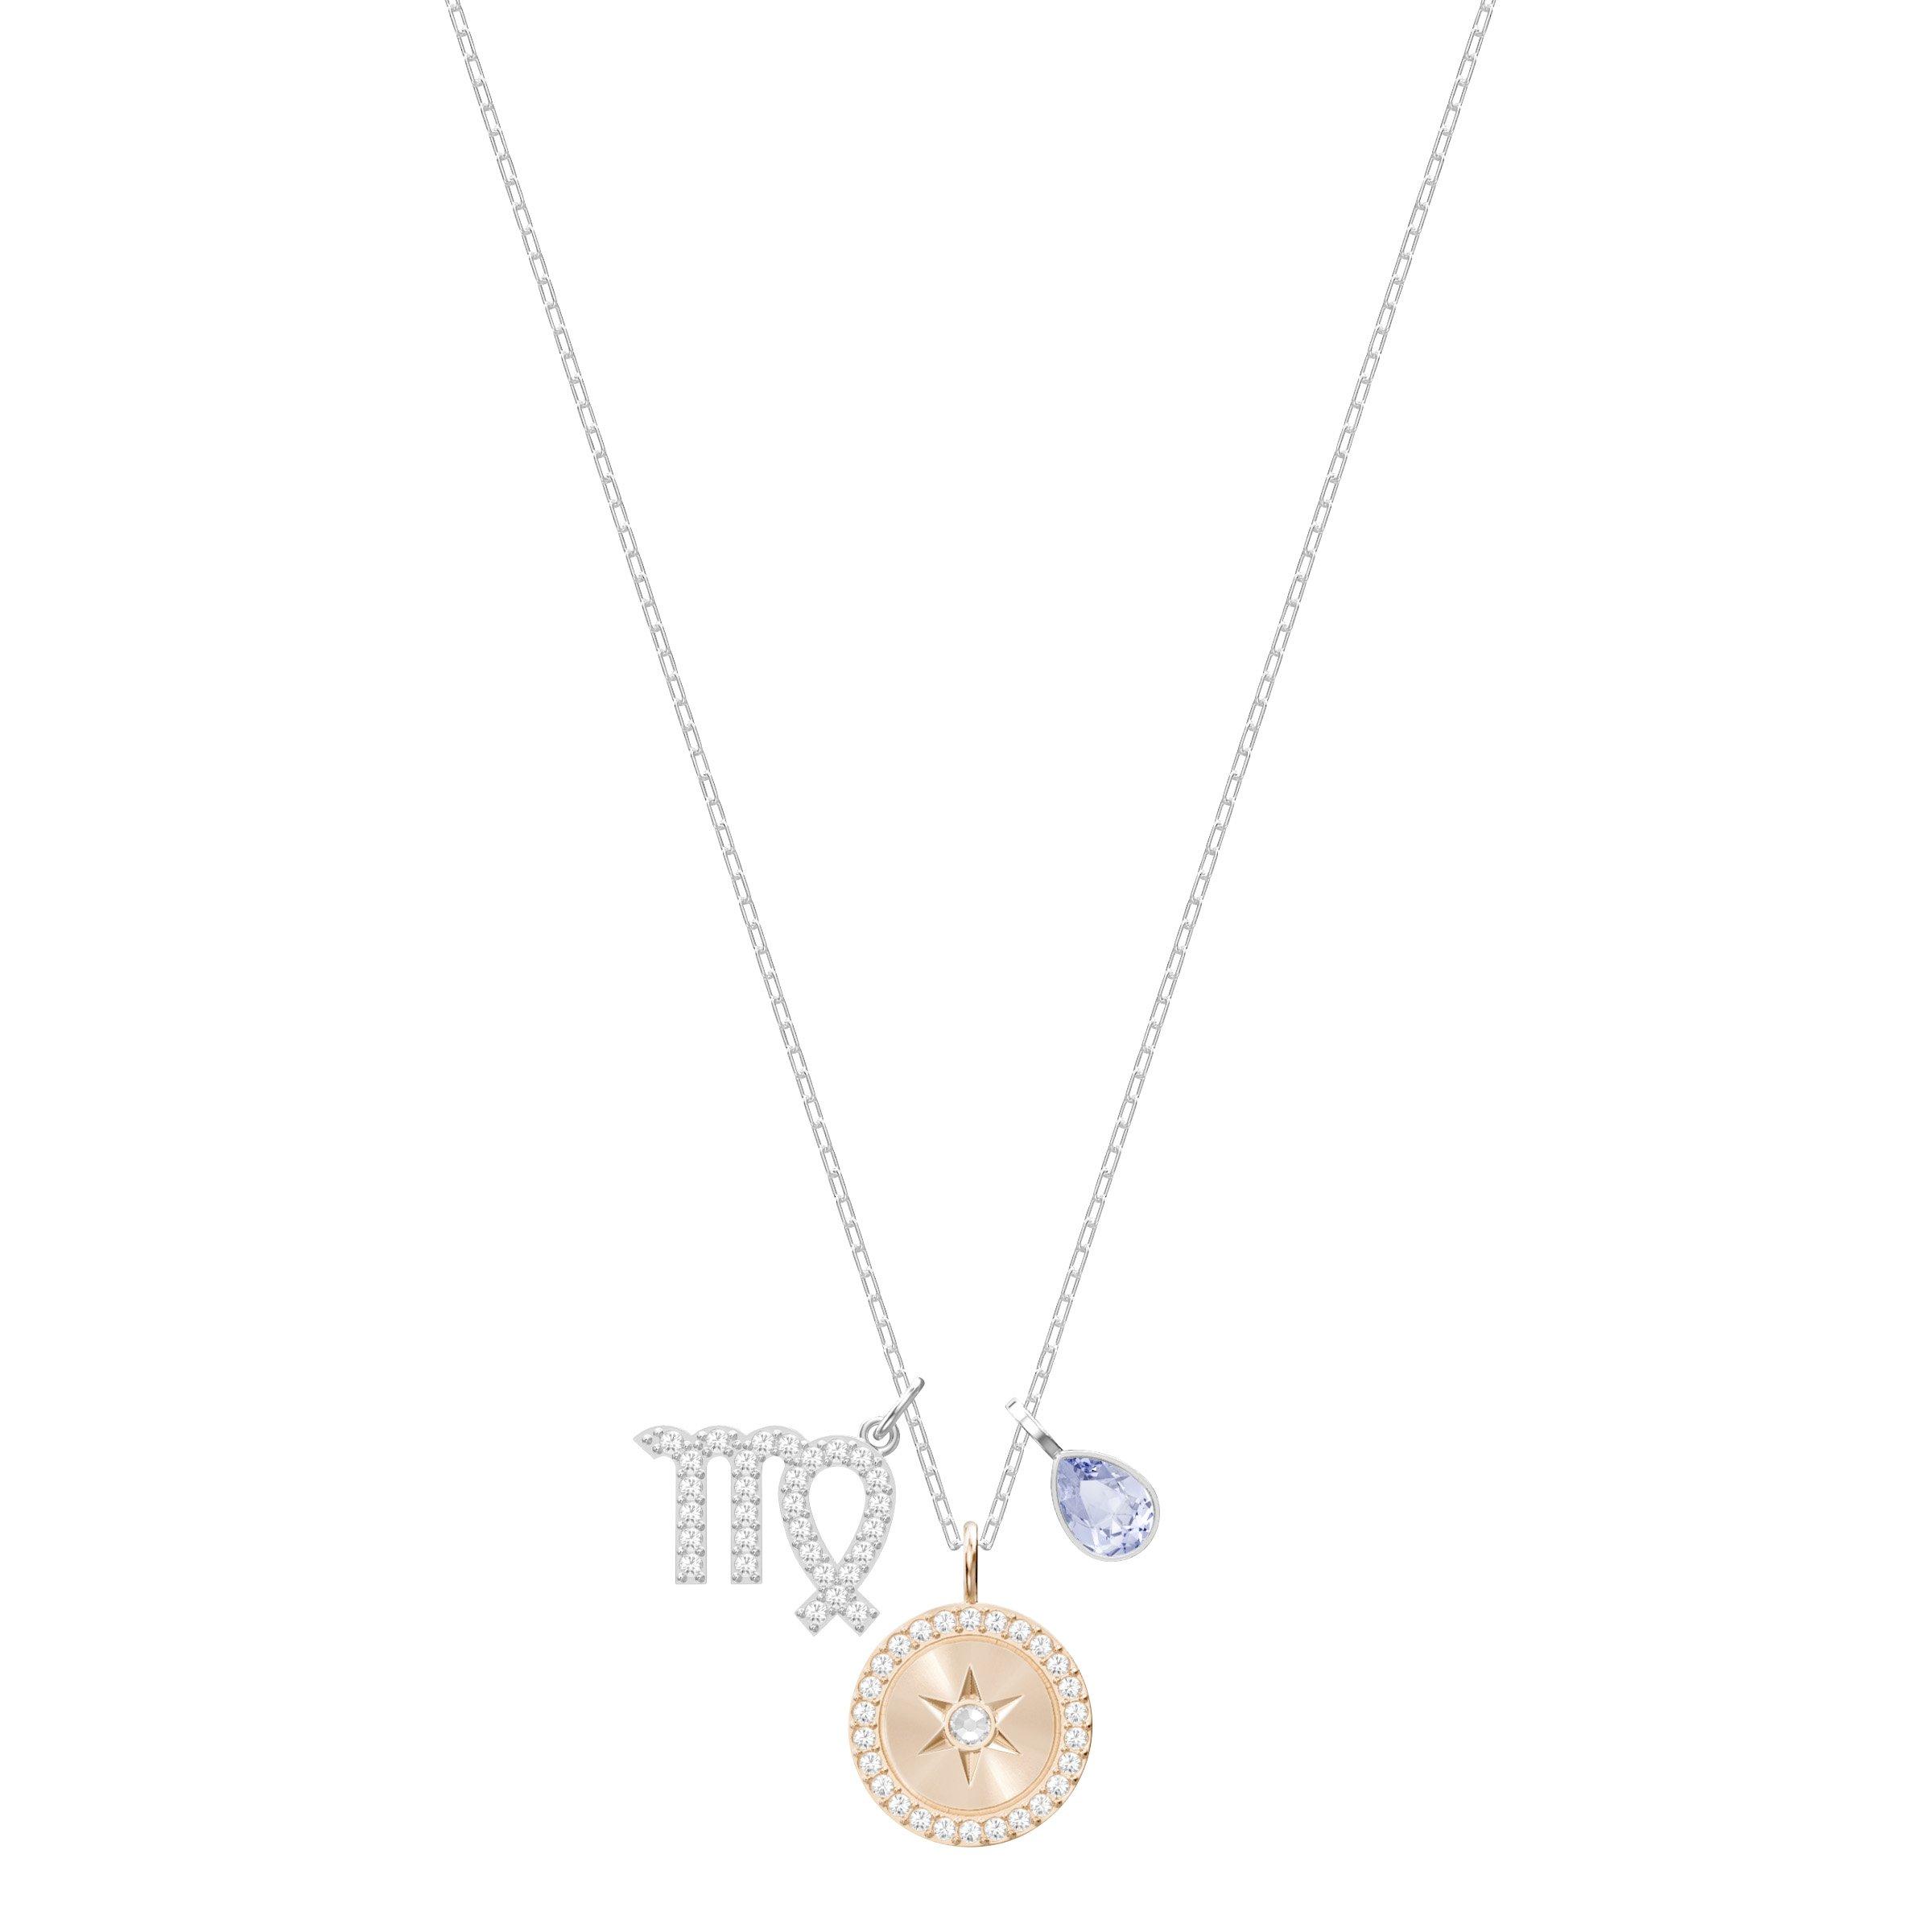 Swarovski Crystal Zodiac Virgo Pendant Necklace